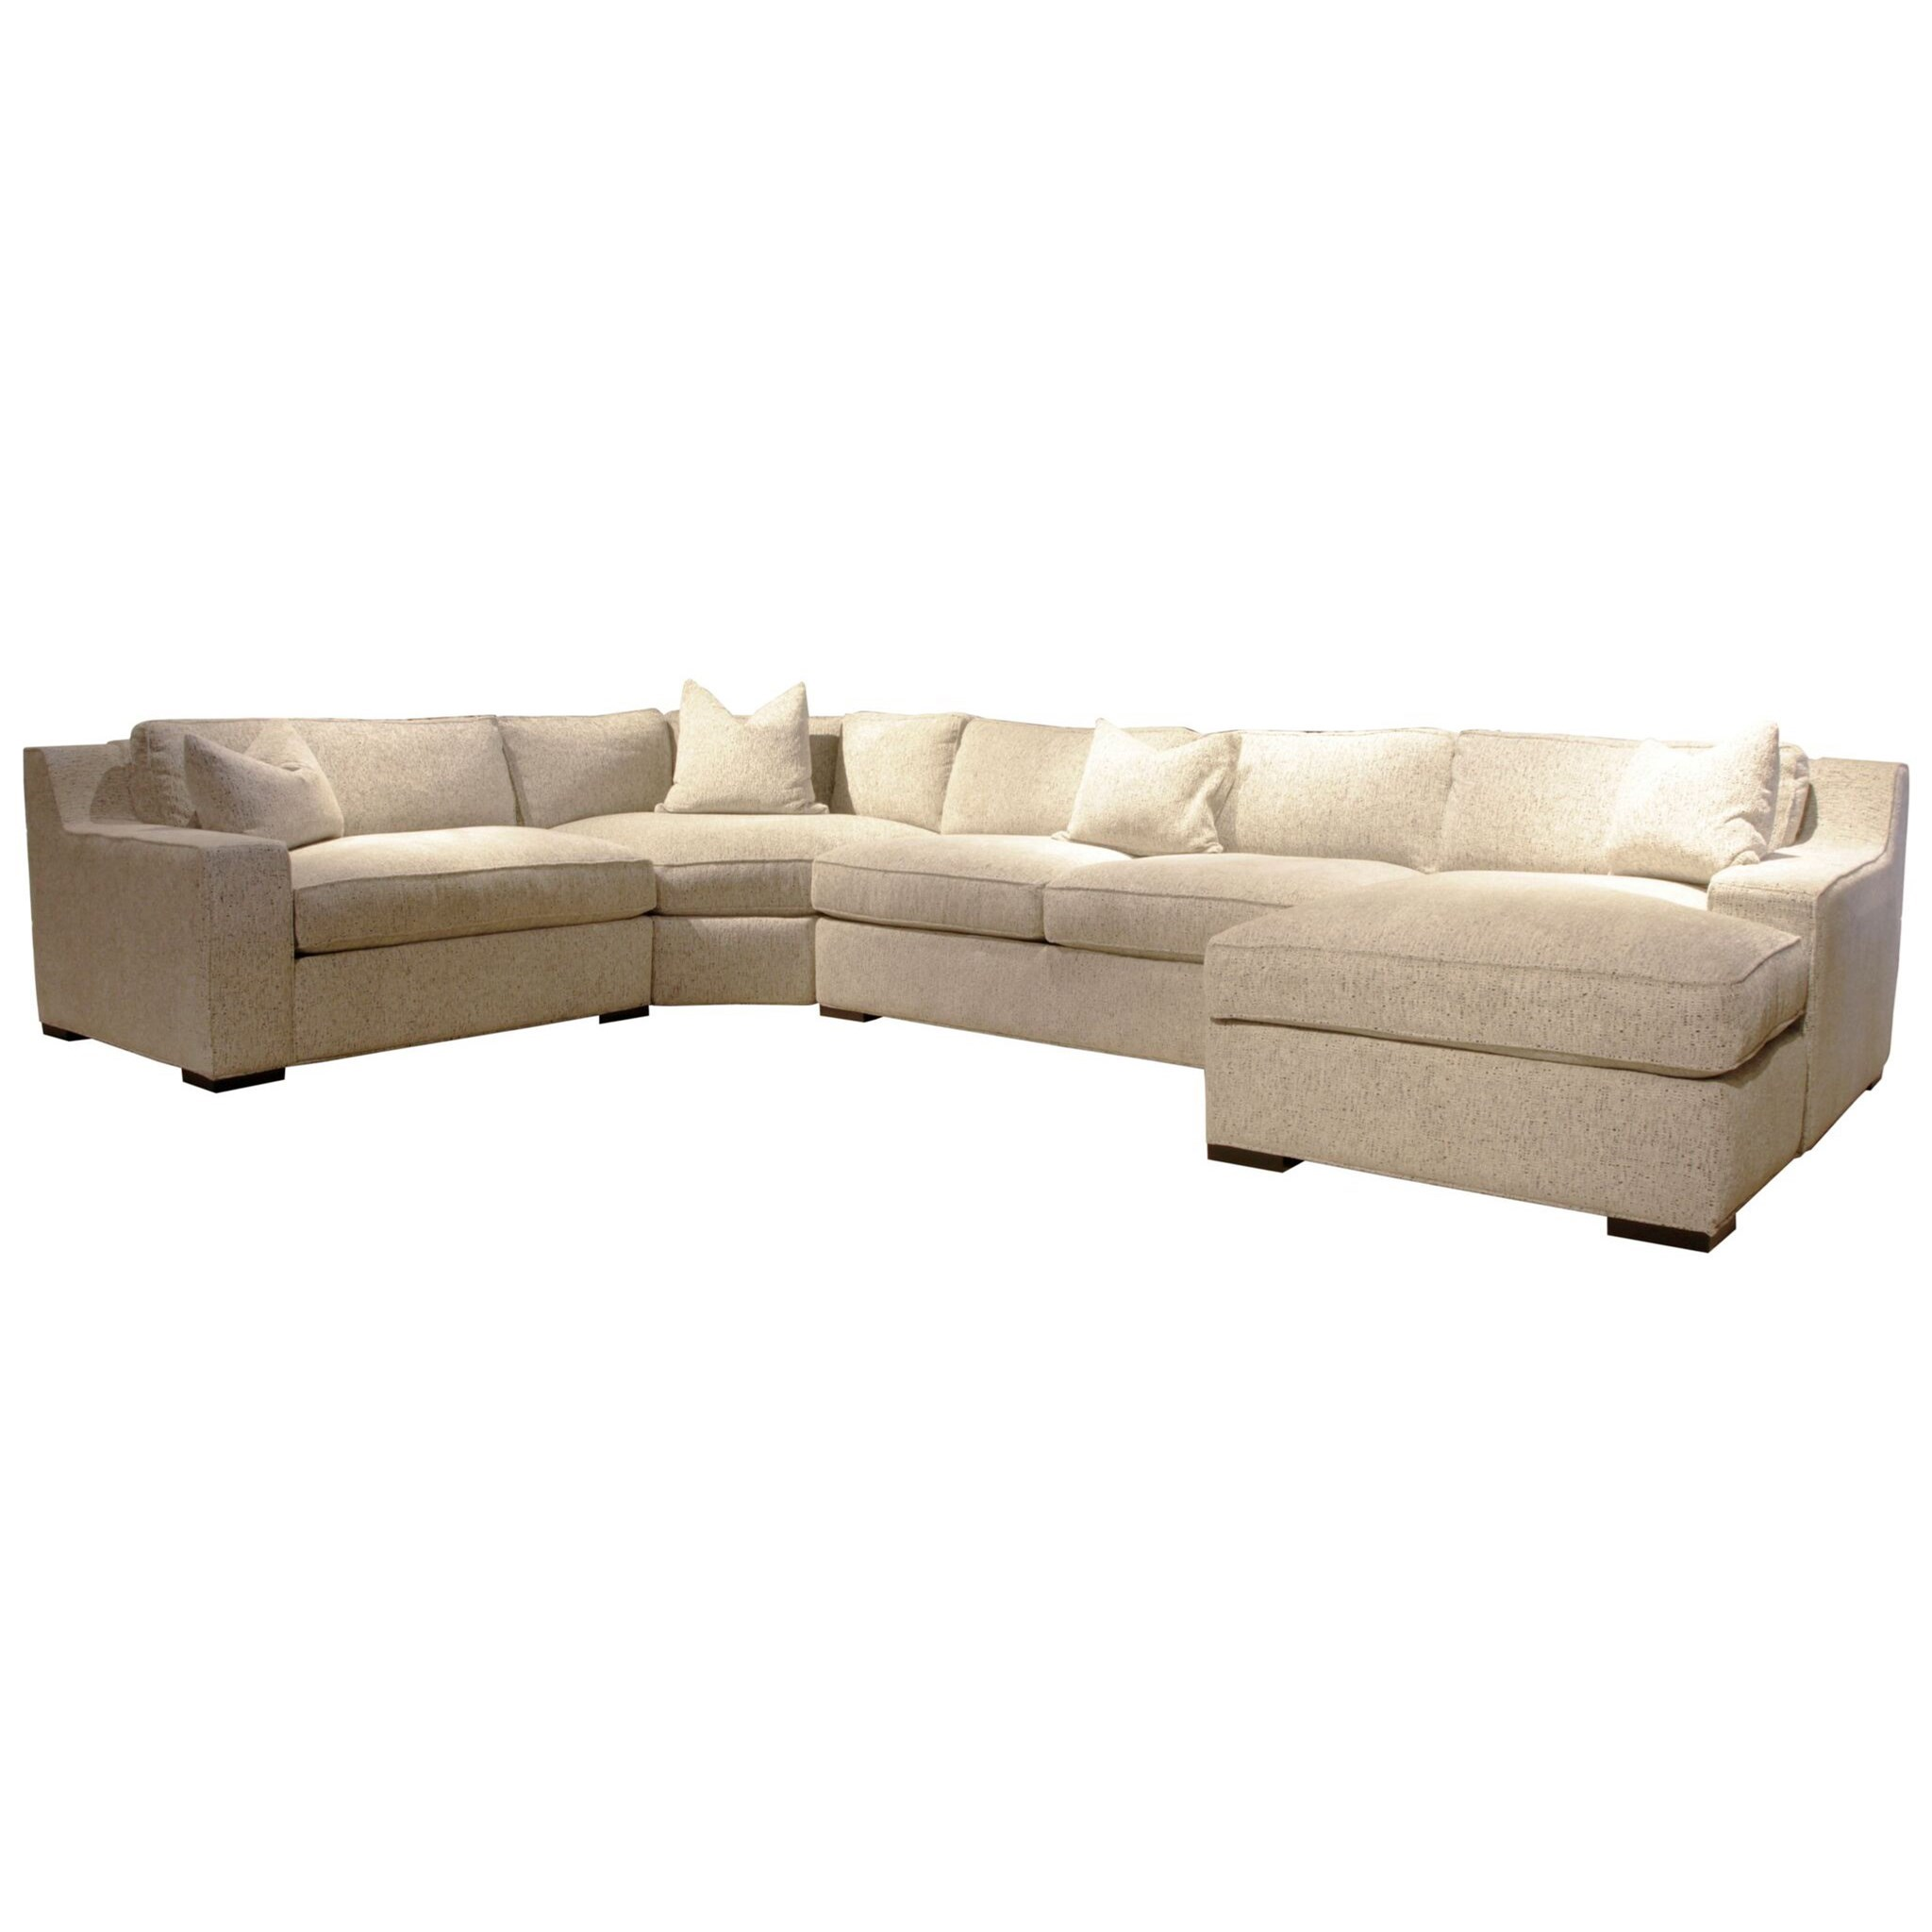 Morello Sectional Sofa by Jonathan Louis at Michael Alan Furniture & Design